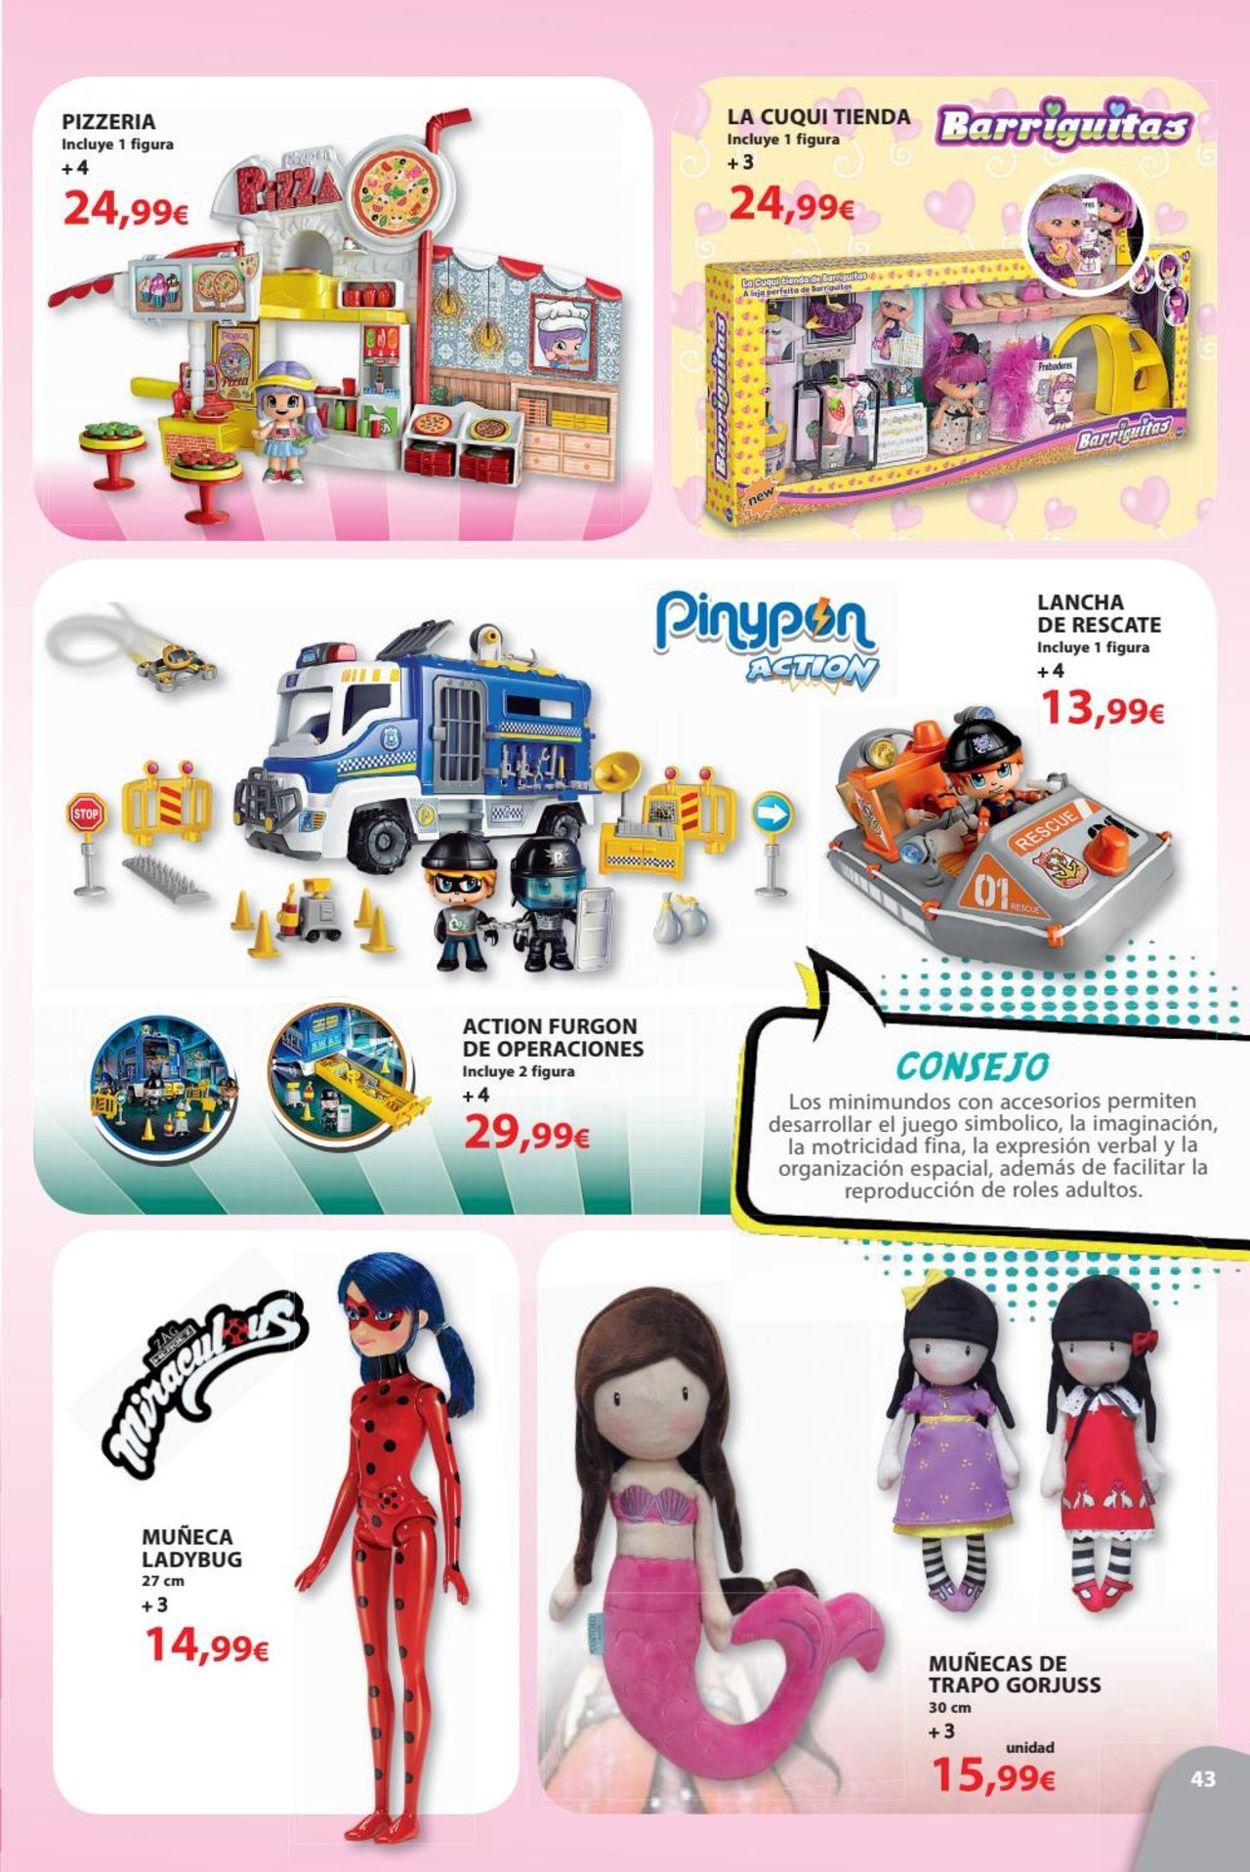 Toy Planet Folleto - 08.06-31.07.2019 (Página 43)